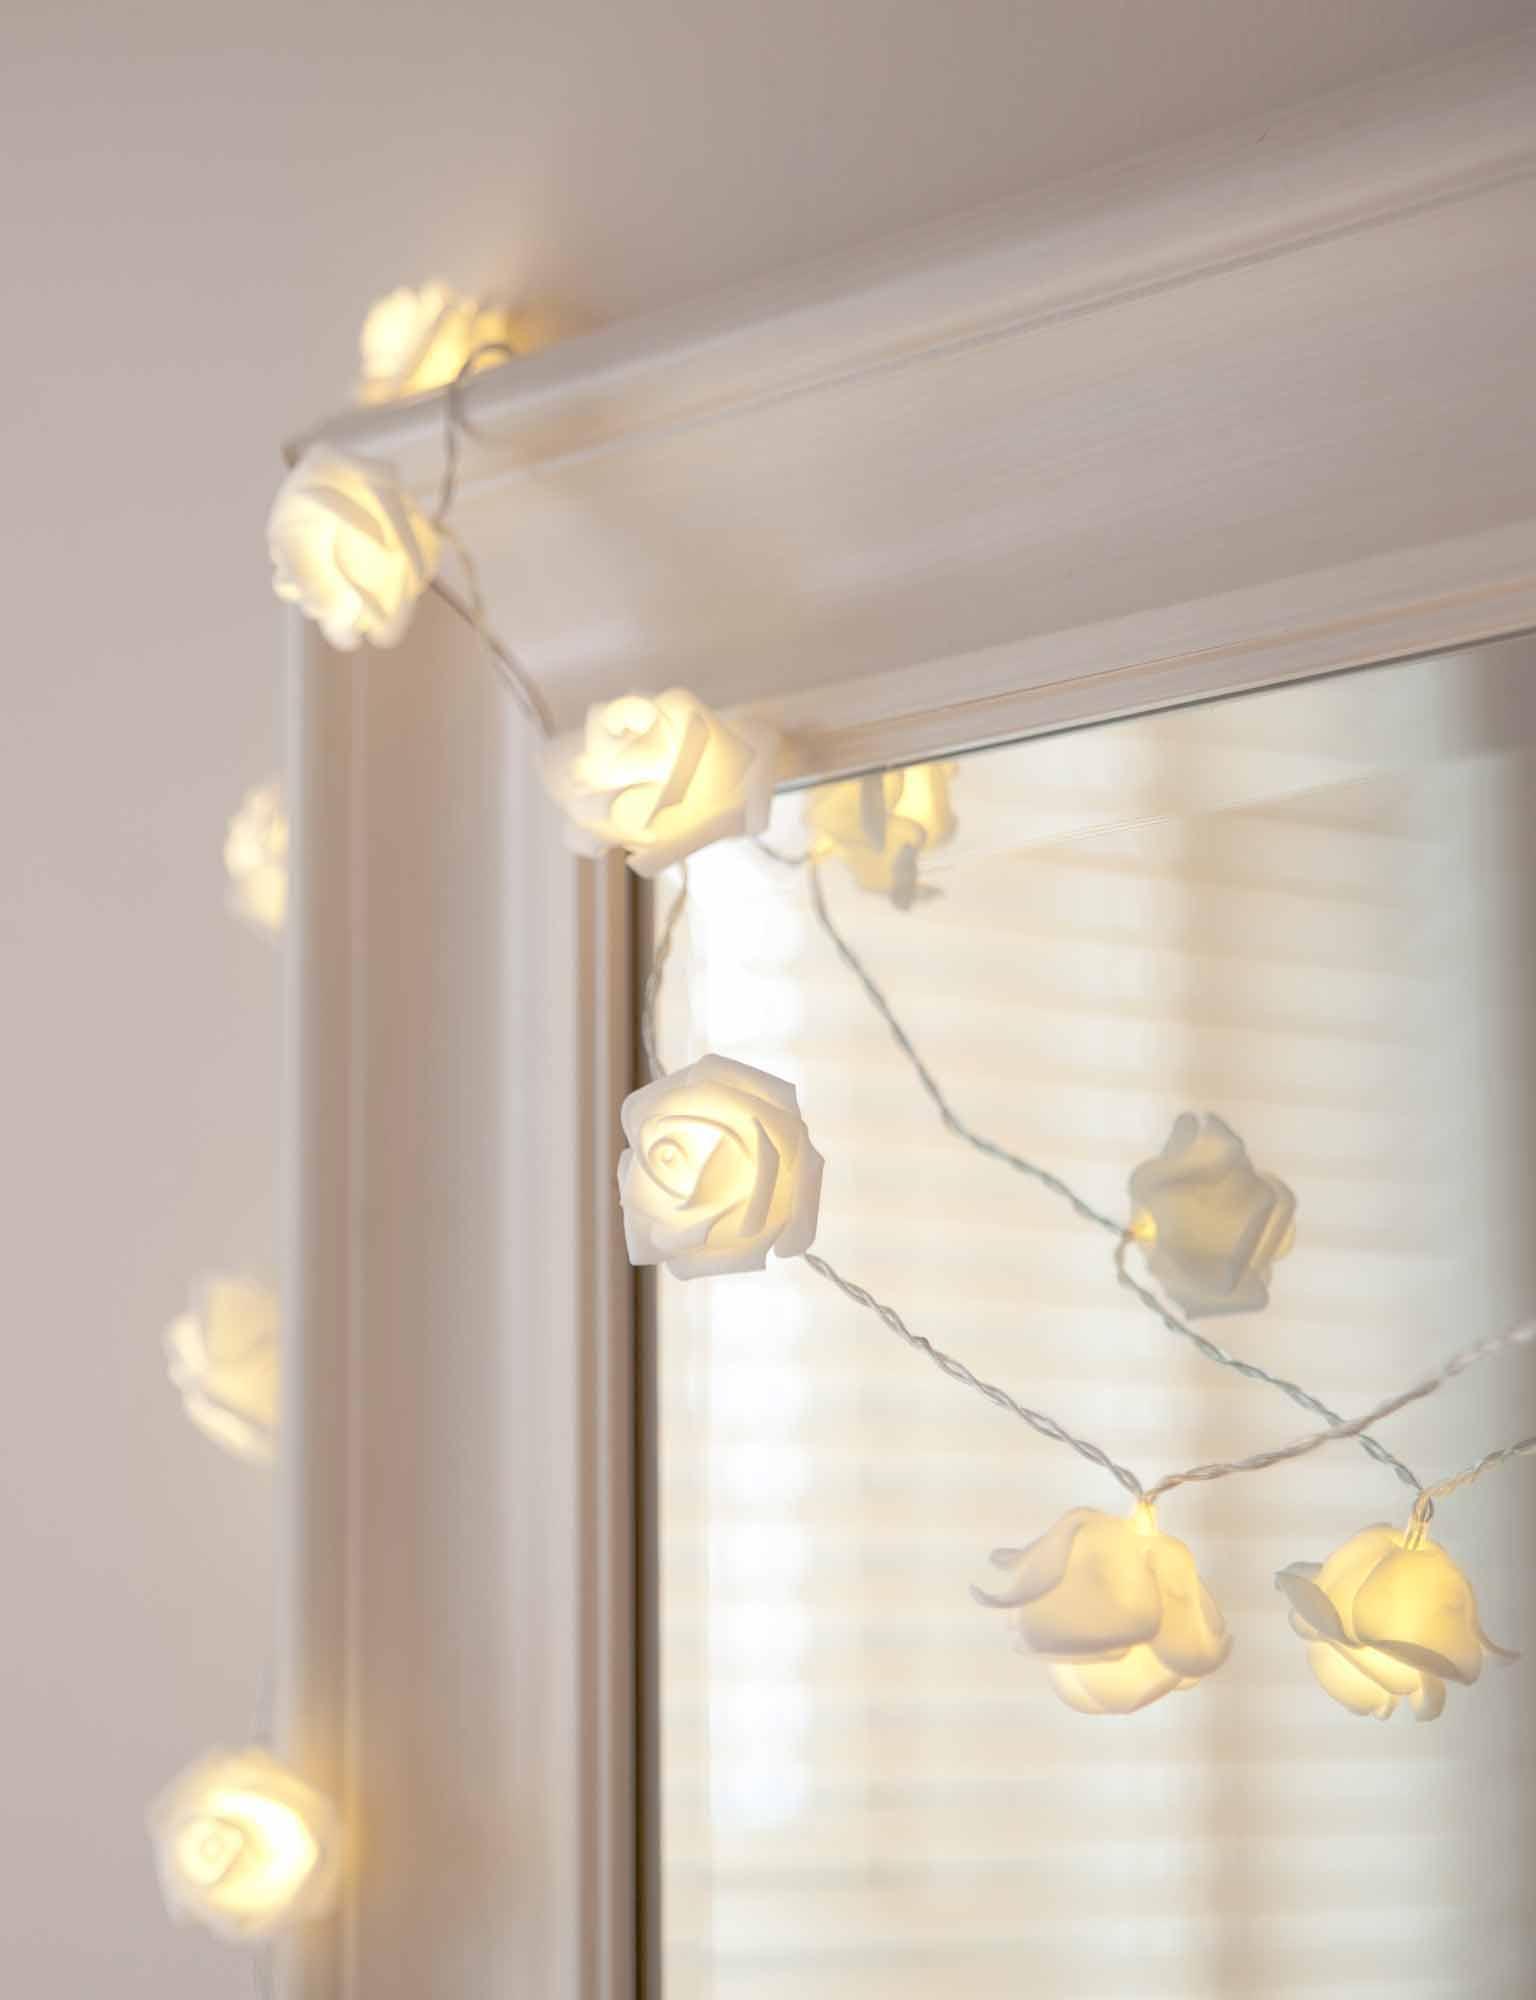 Lichterkette aufhängen wand